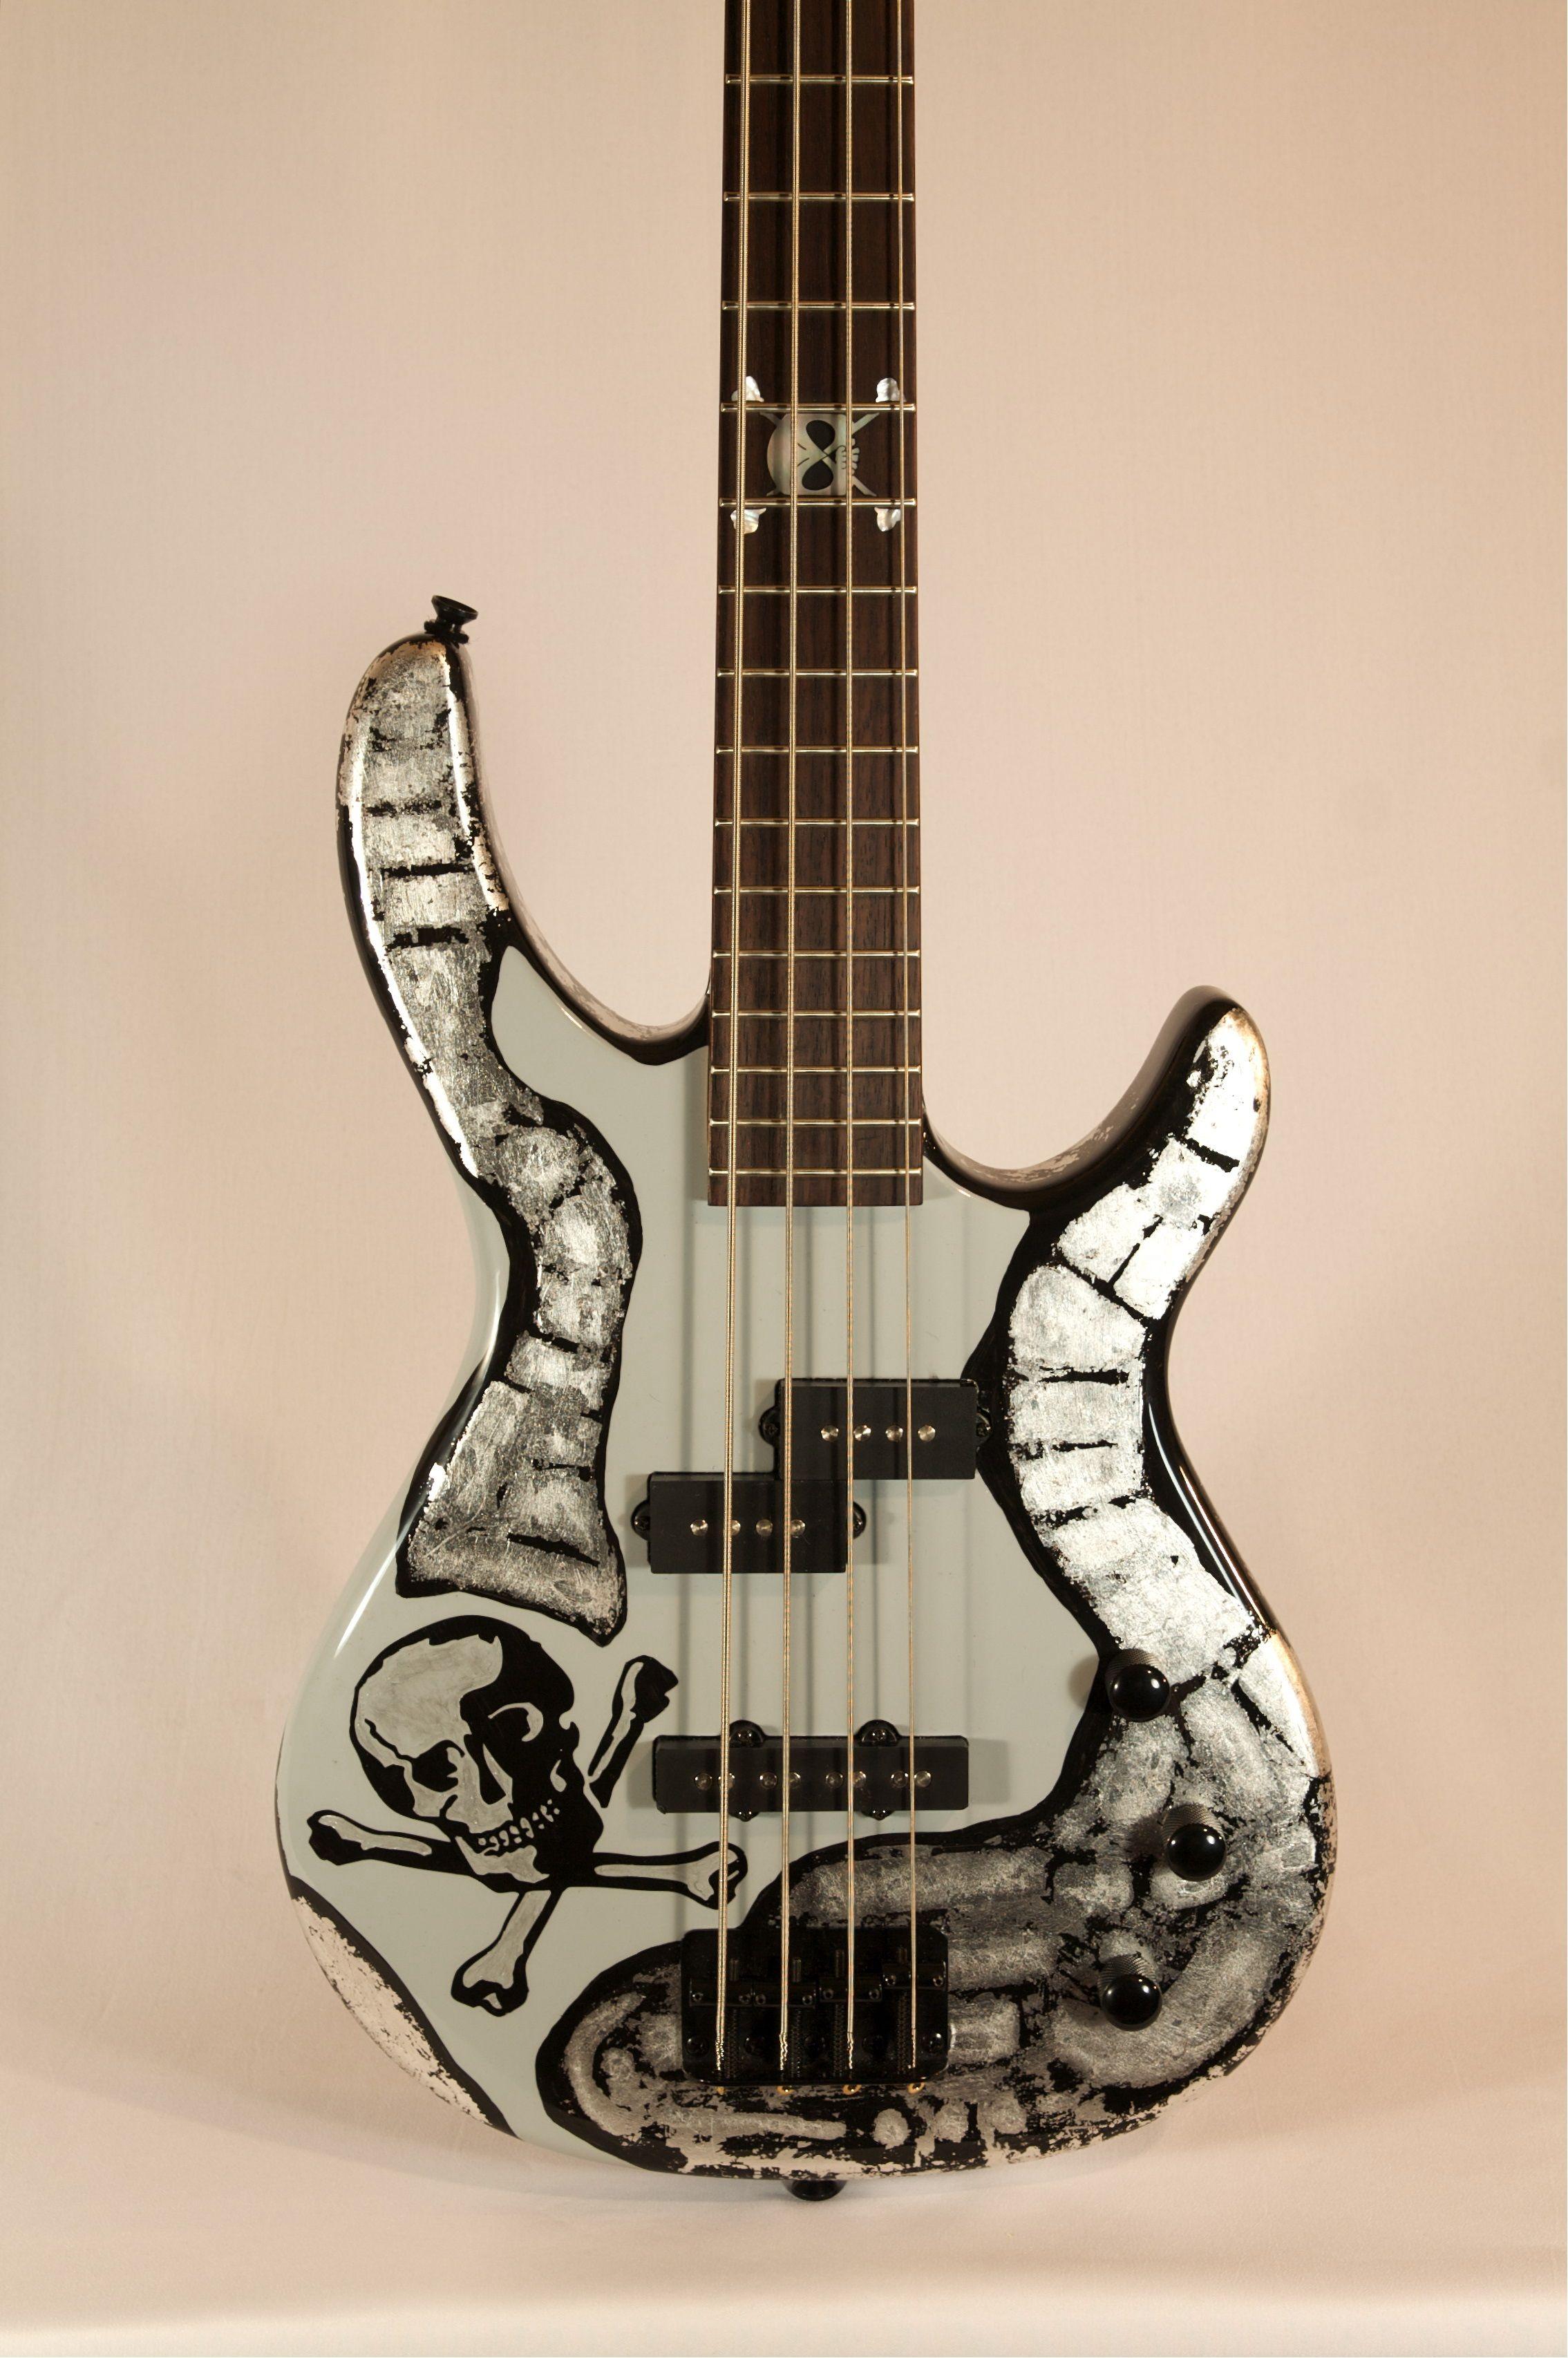 Dreaming of you guitar